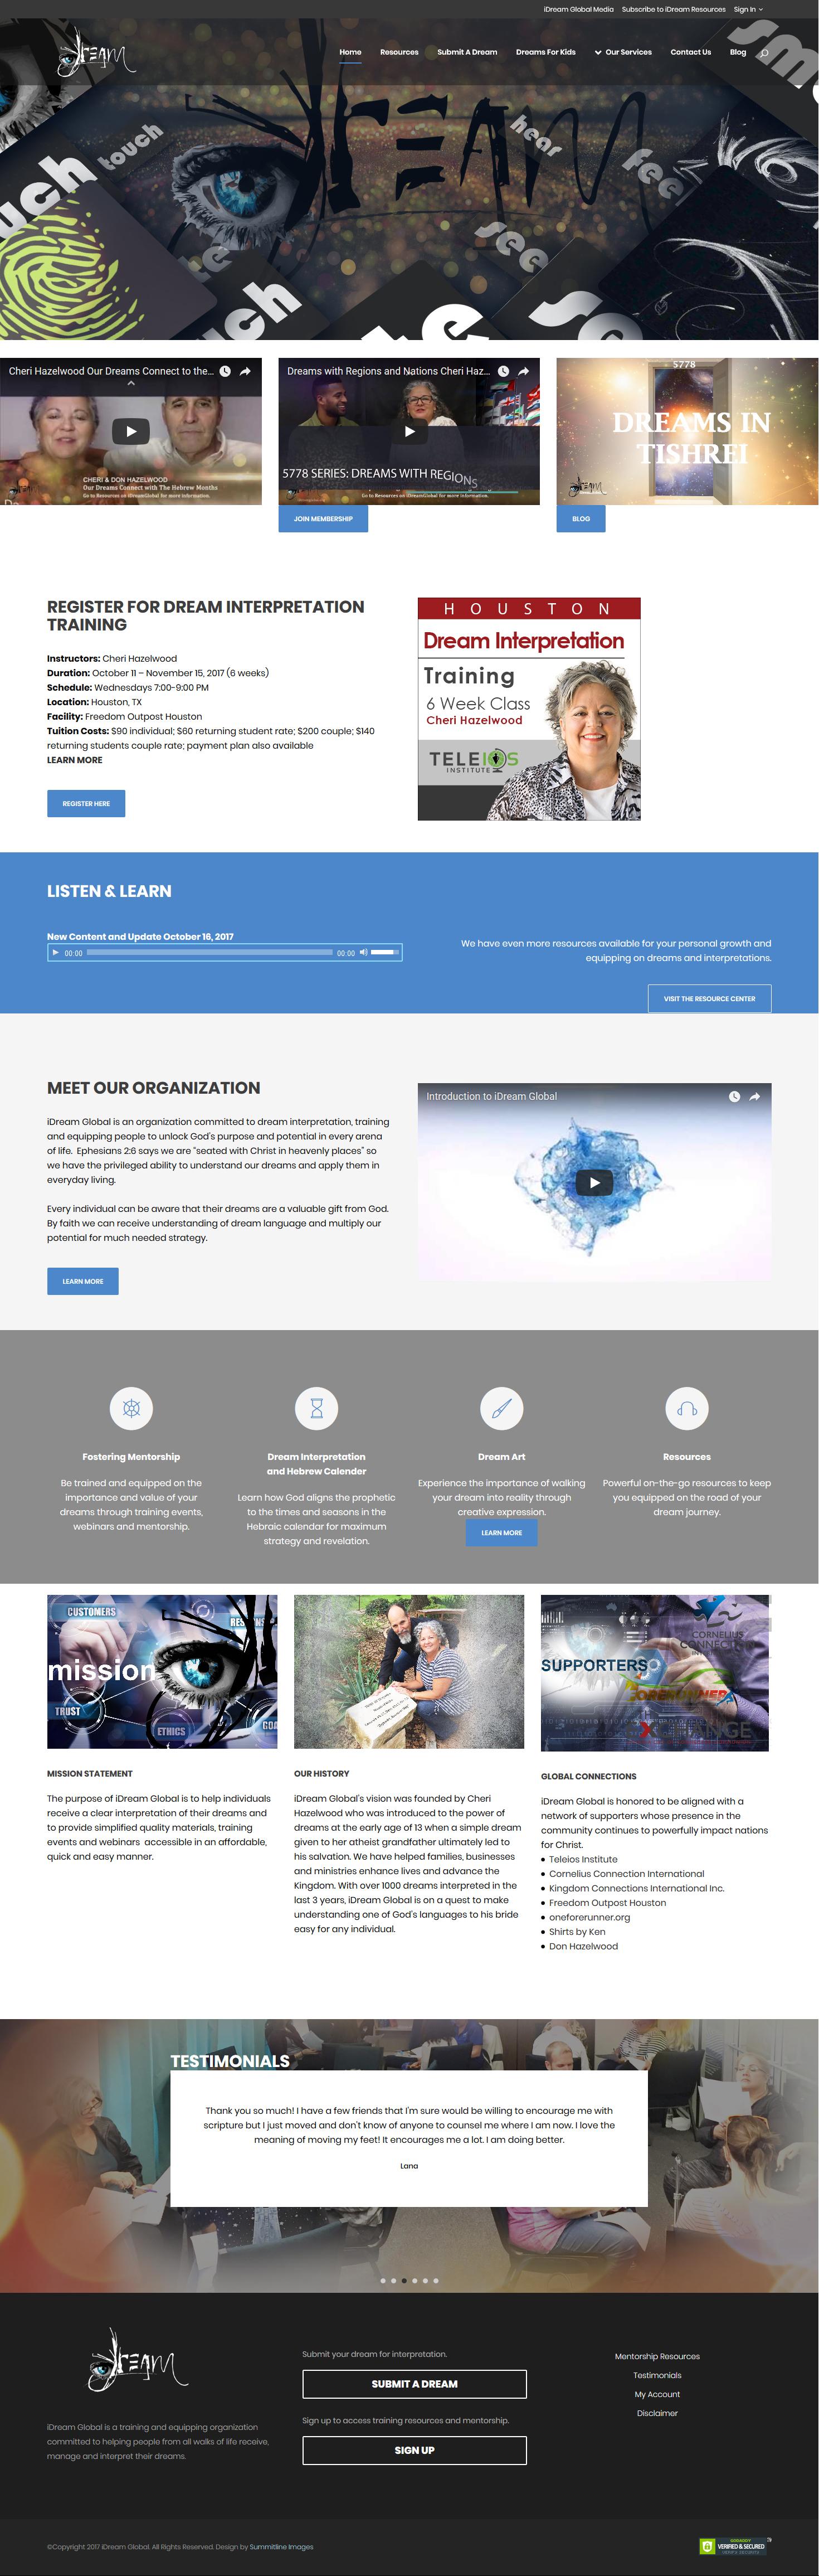 iDream Global Website